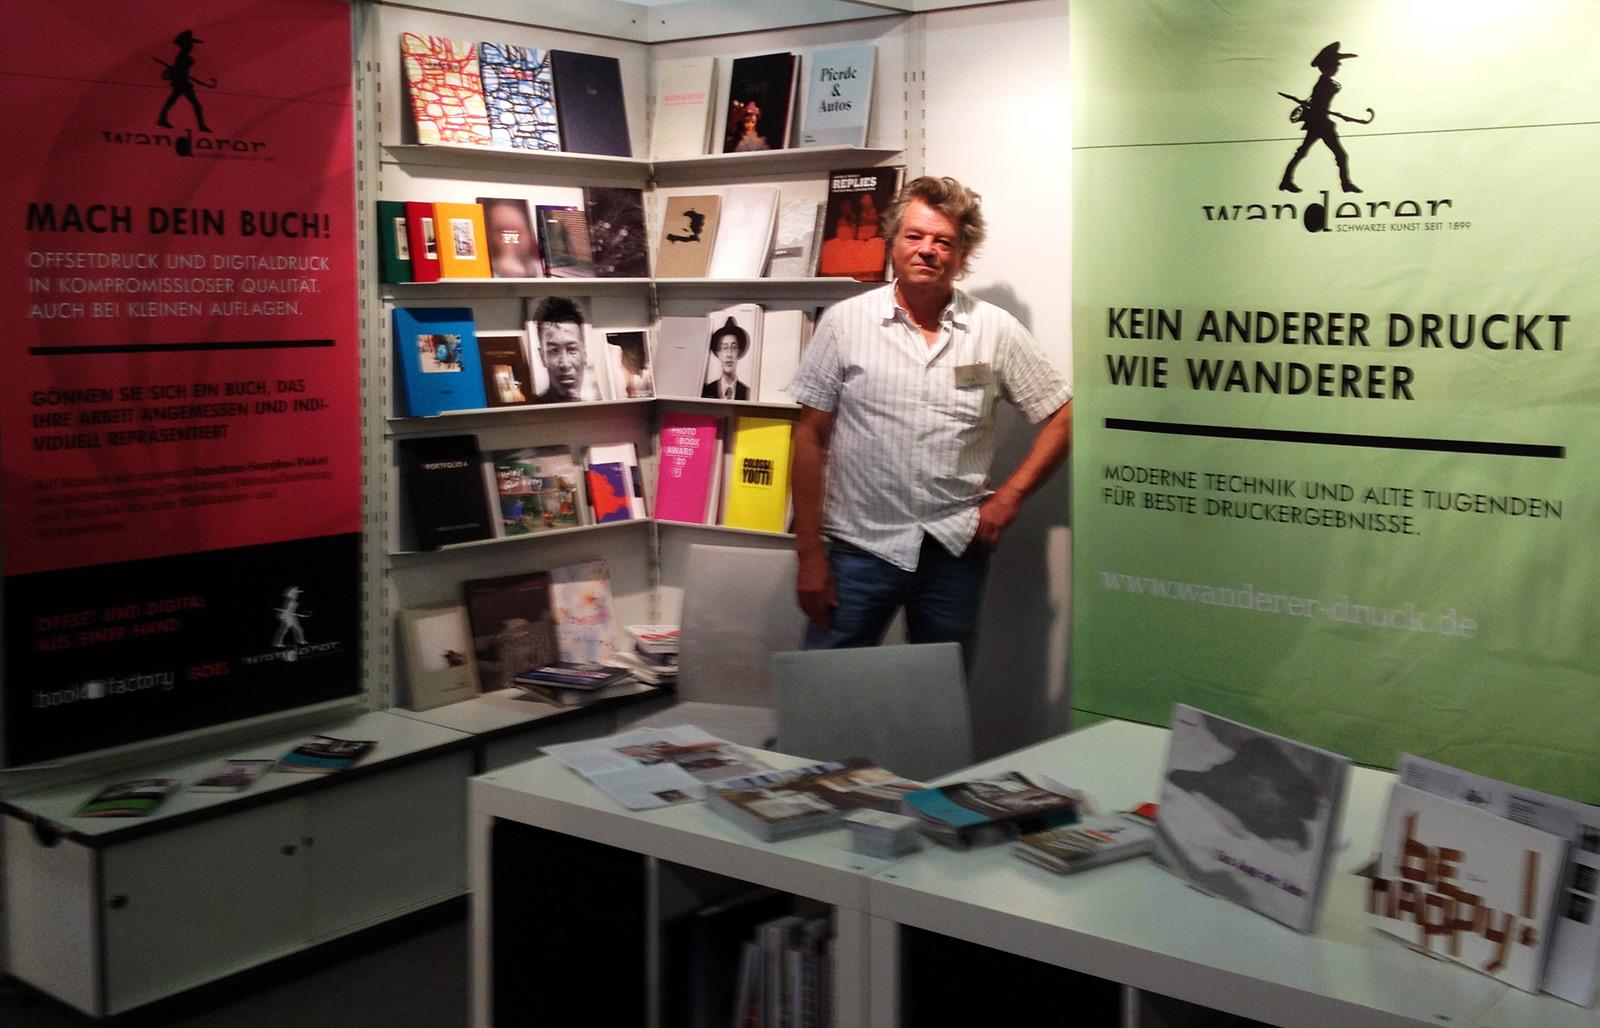 Adieu, Frankfurter Buchmesse